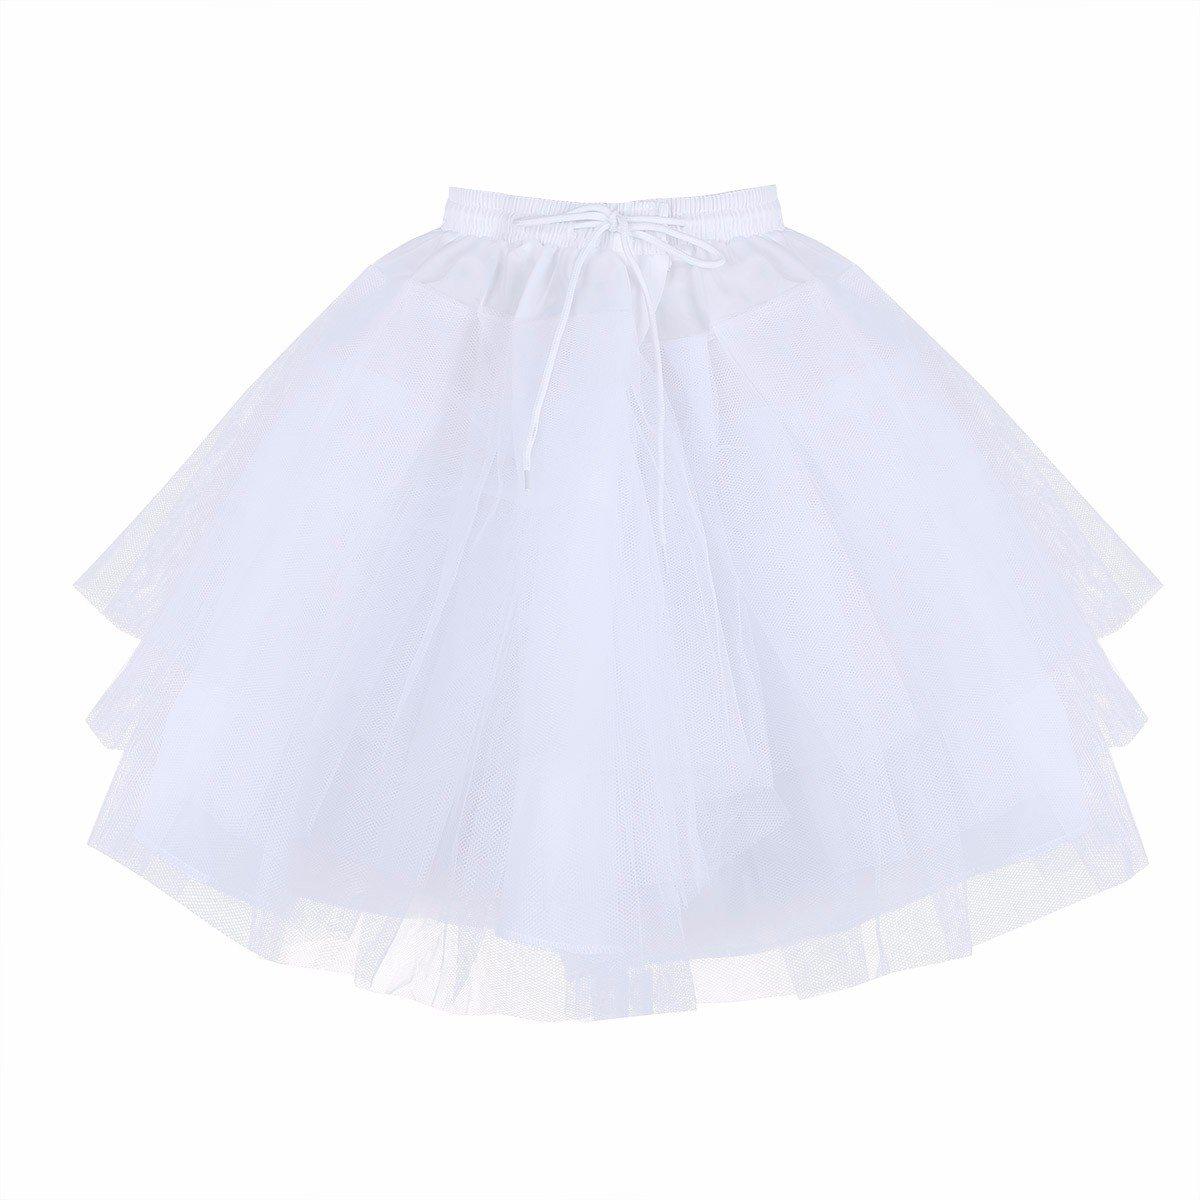 iEFiEL Kids Flower Girls' 3 Layers Wedding A-Line Dress Crinoline Petticoat Underskirt Slips